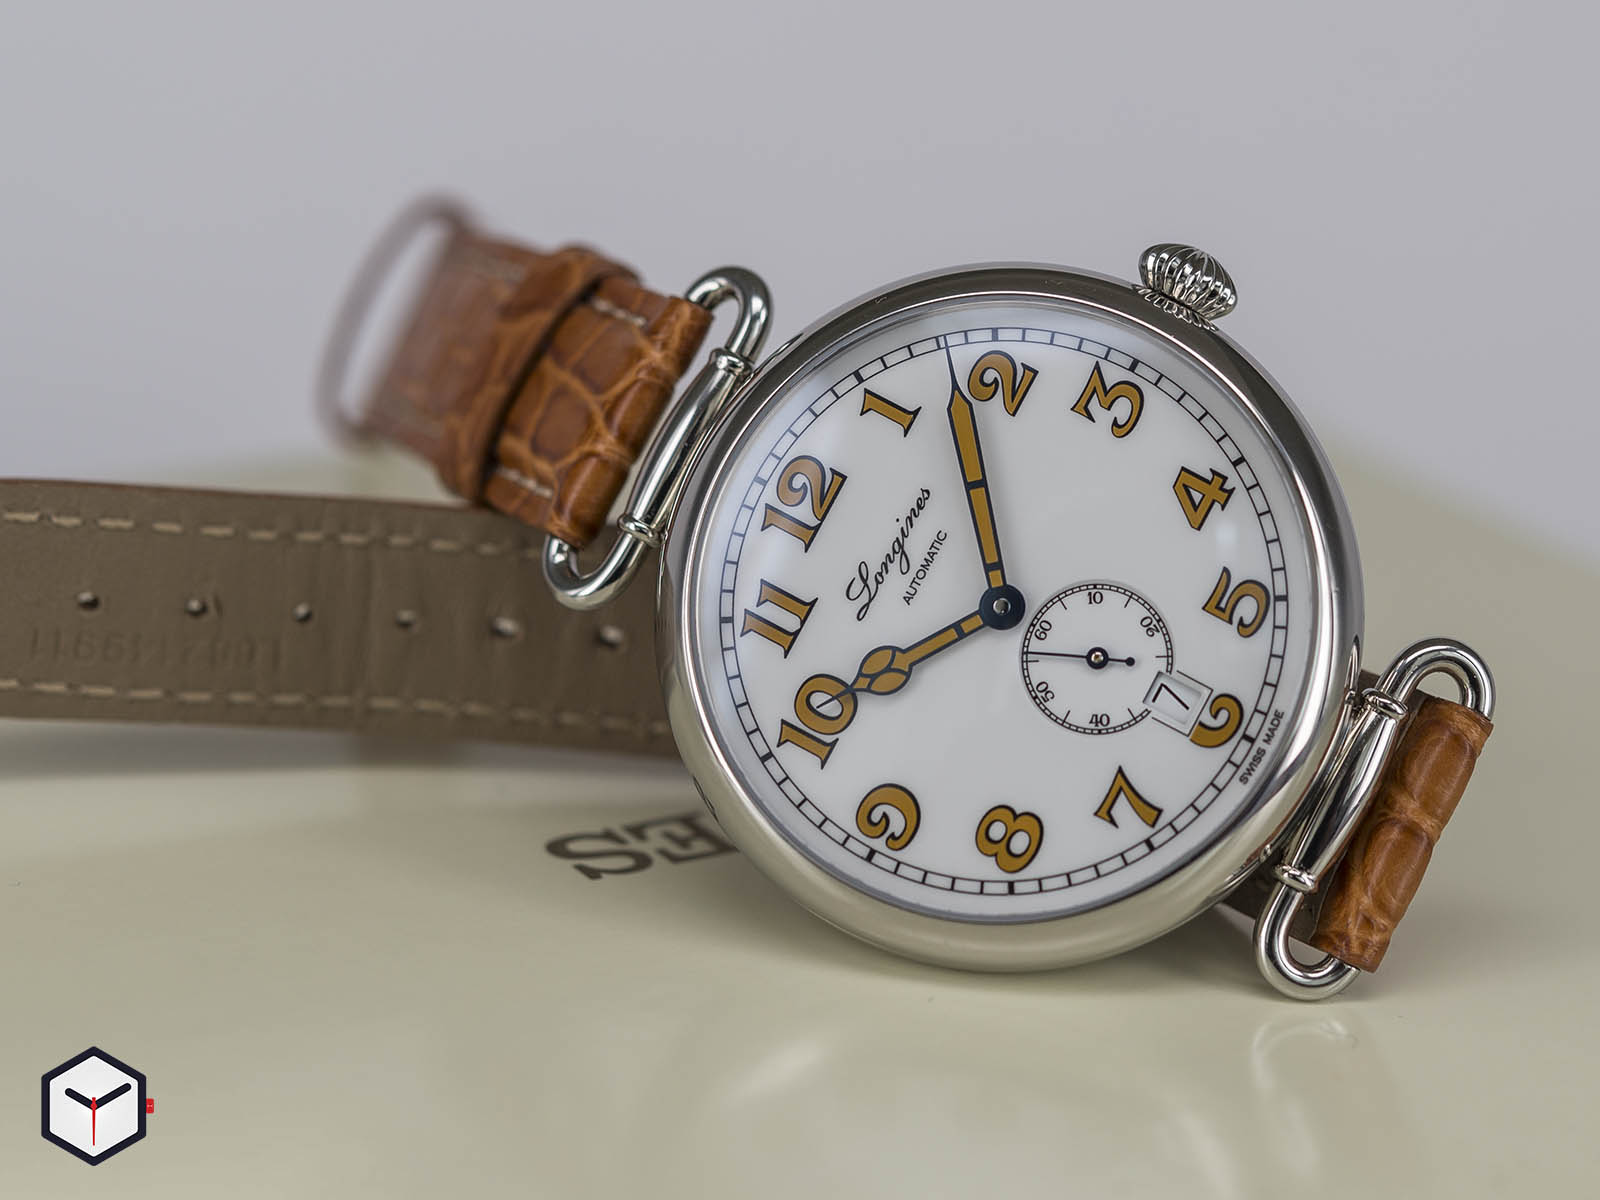 heritage-watches-11.jpg